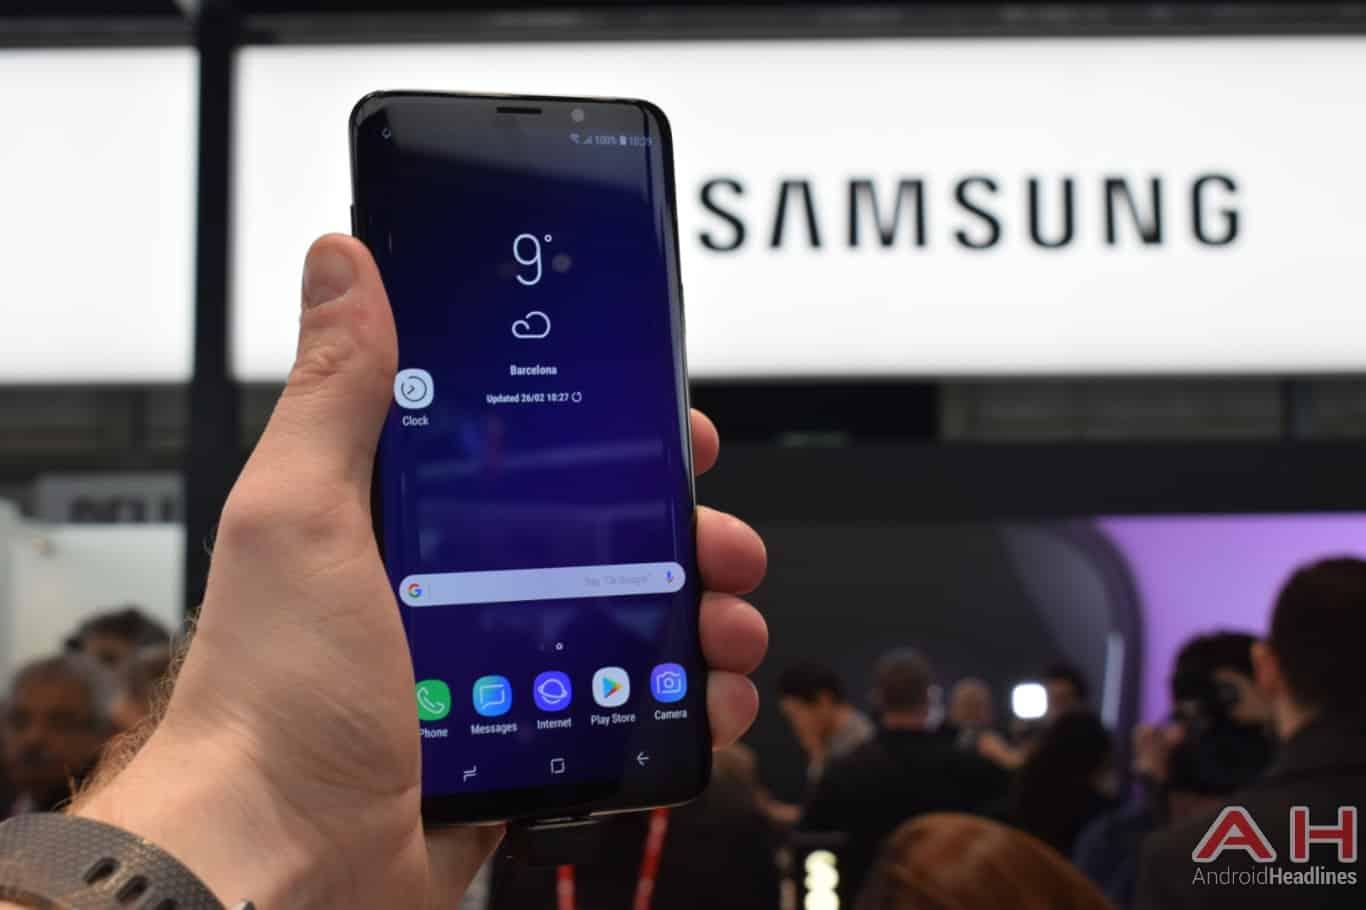 AH Samsung Galaxy S9 Plus MWC 2018 image 116